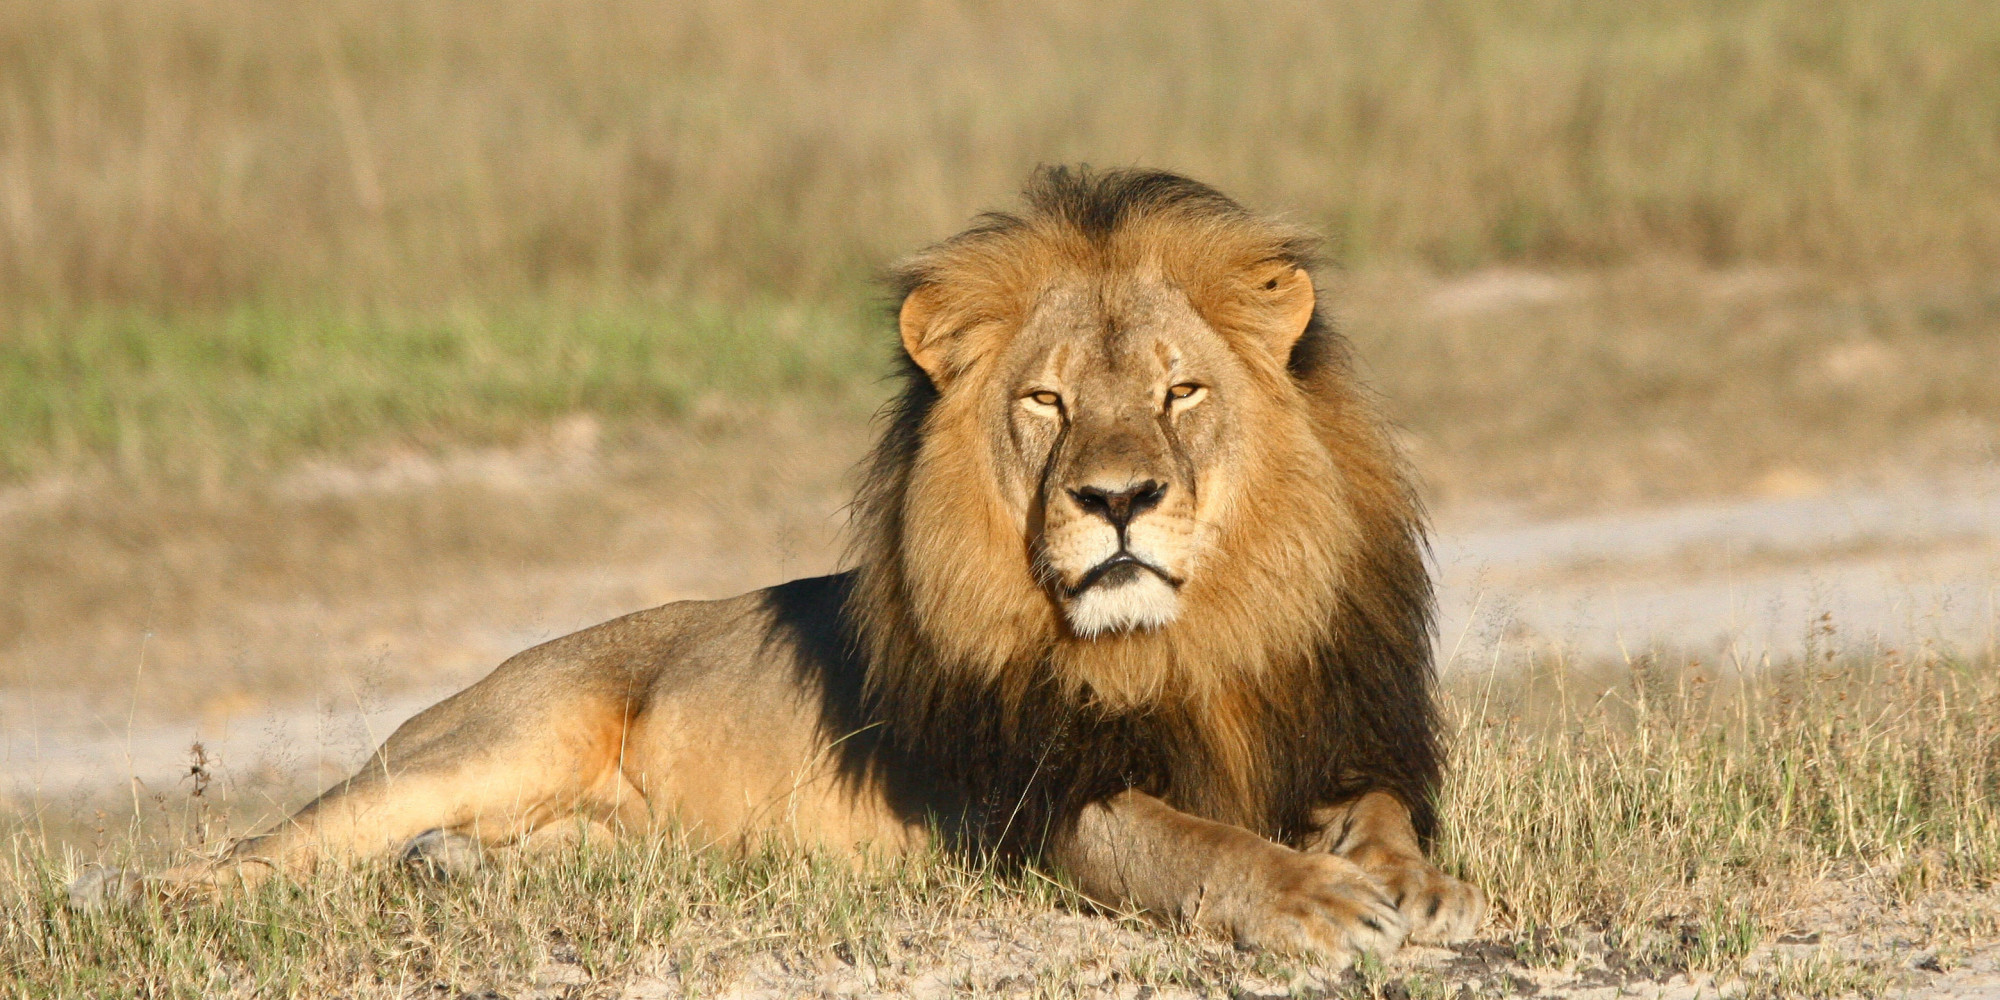 Steve Backshall Cecil the lion